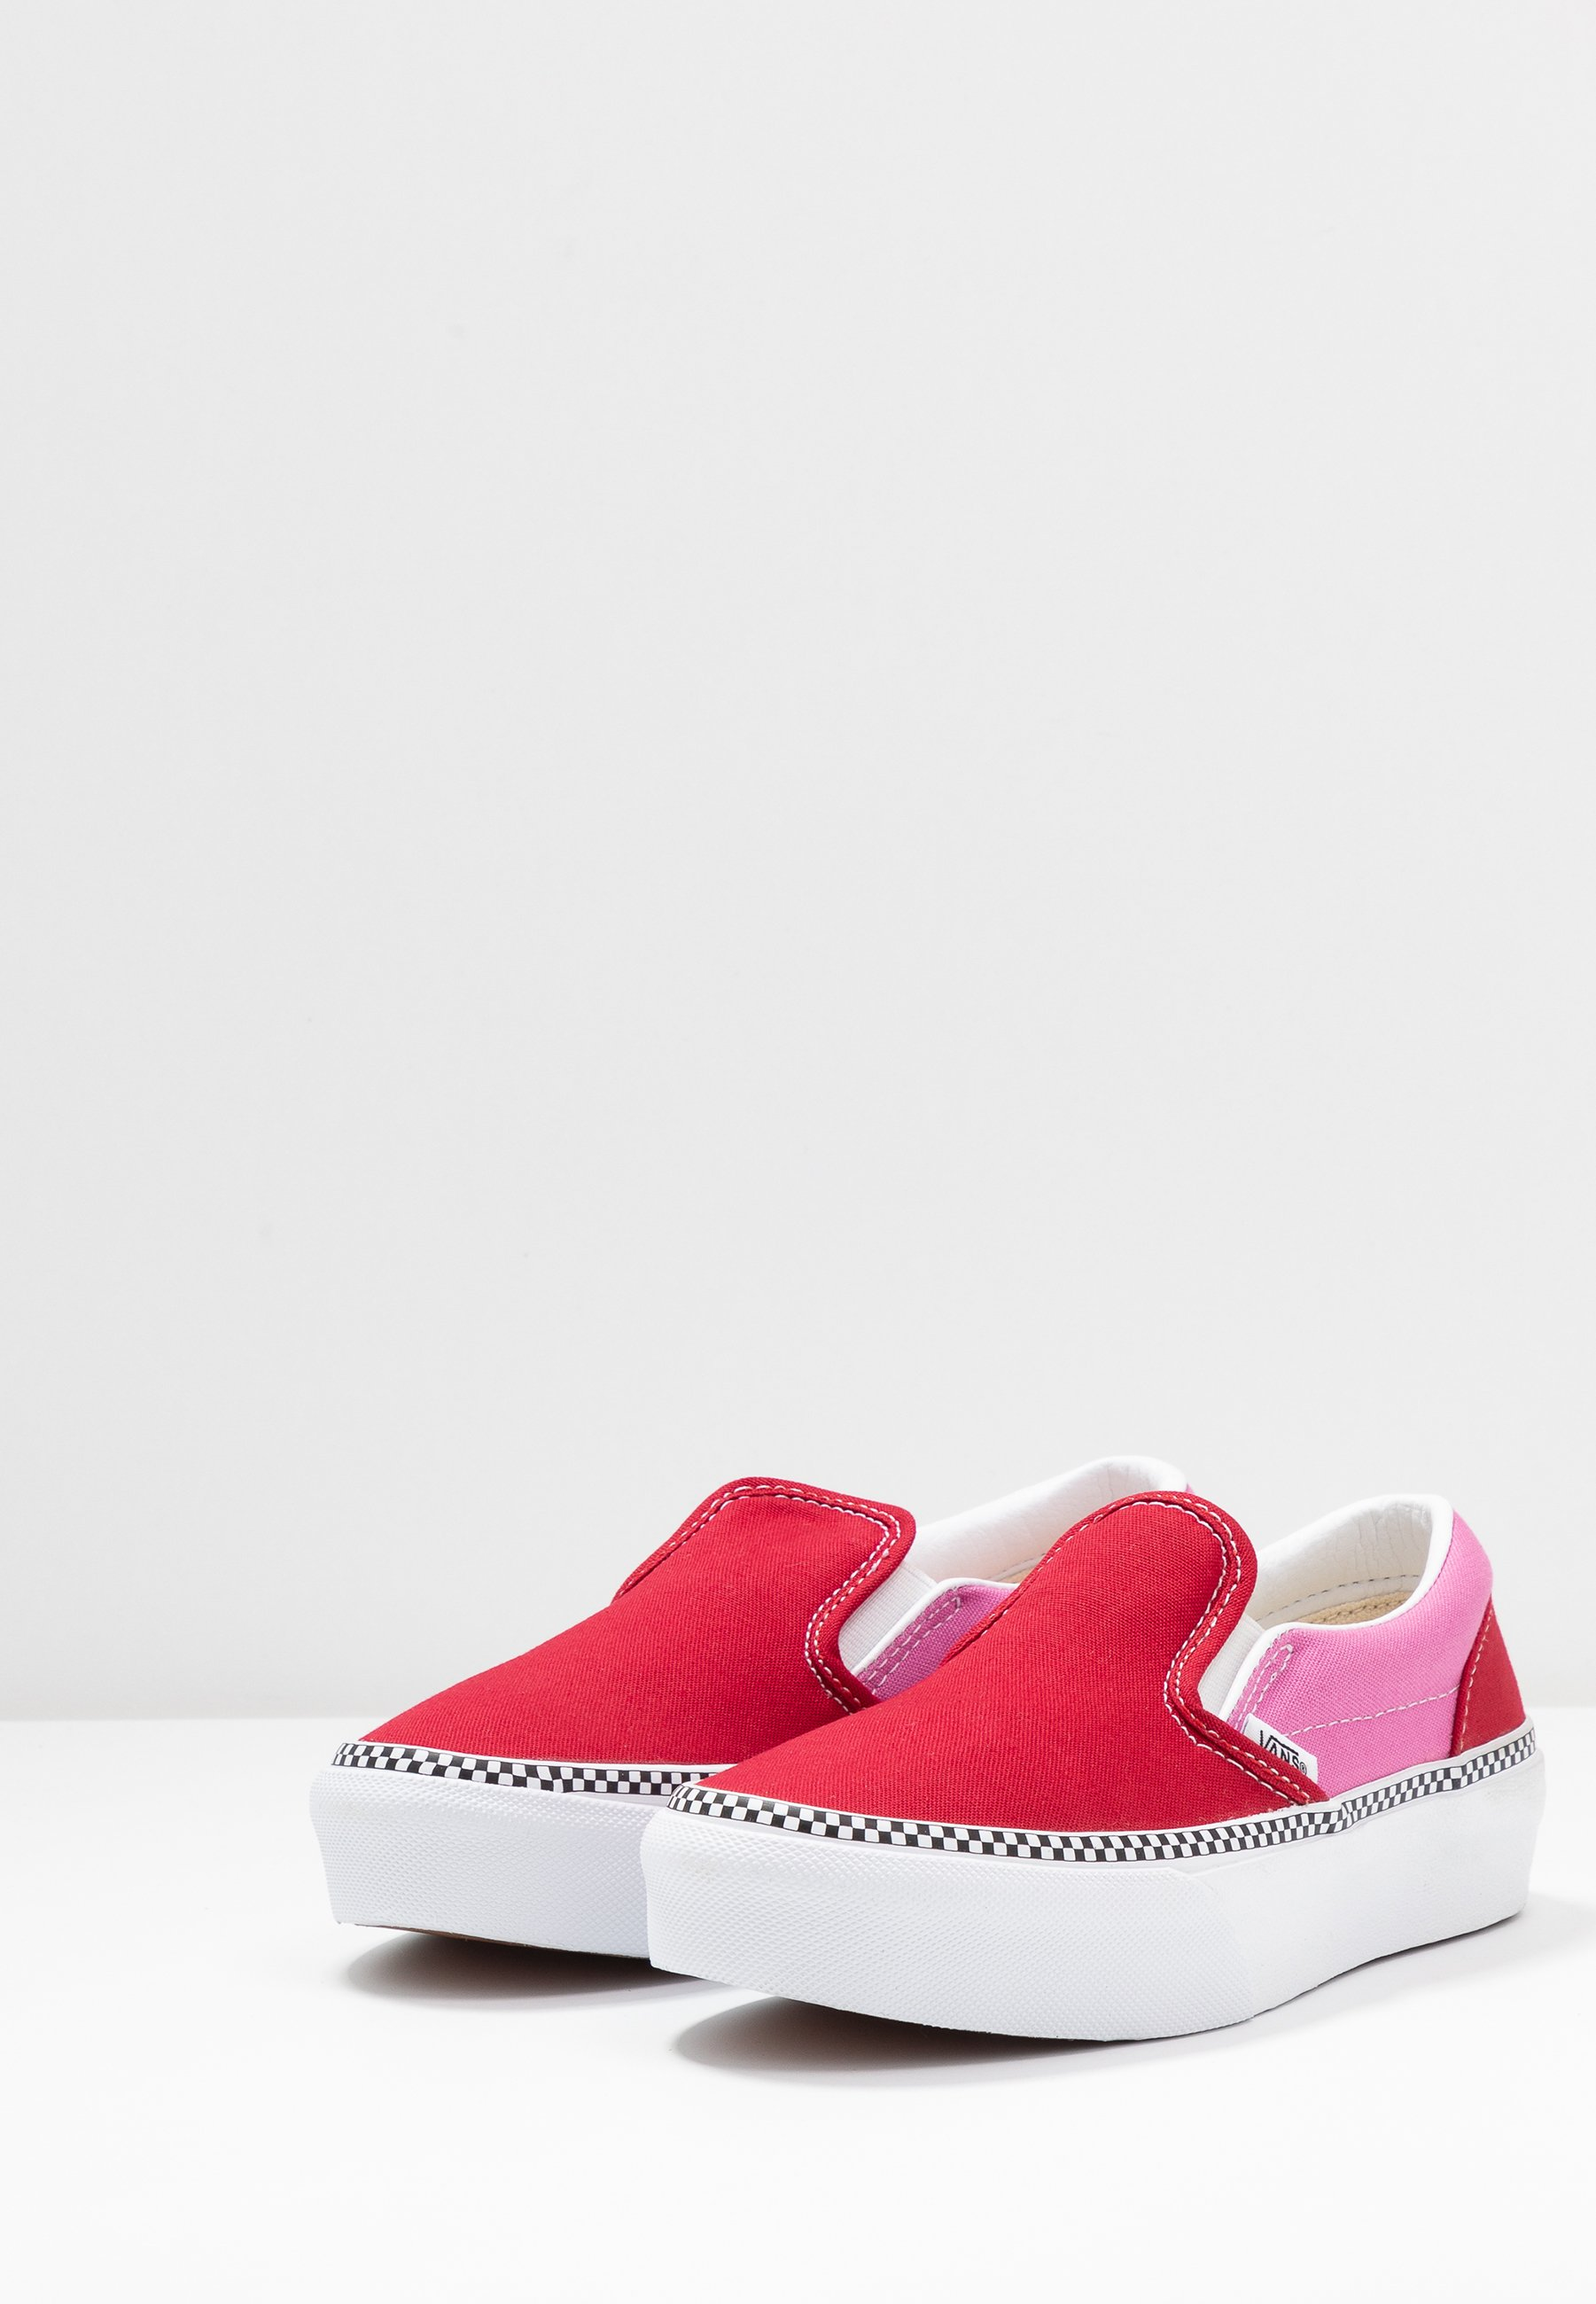 Vans CLASSIC SLIP-ON PLATFORM - Półbuty wsuwane - chili pepper/fuchsia pink